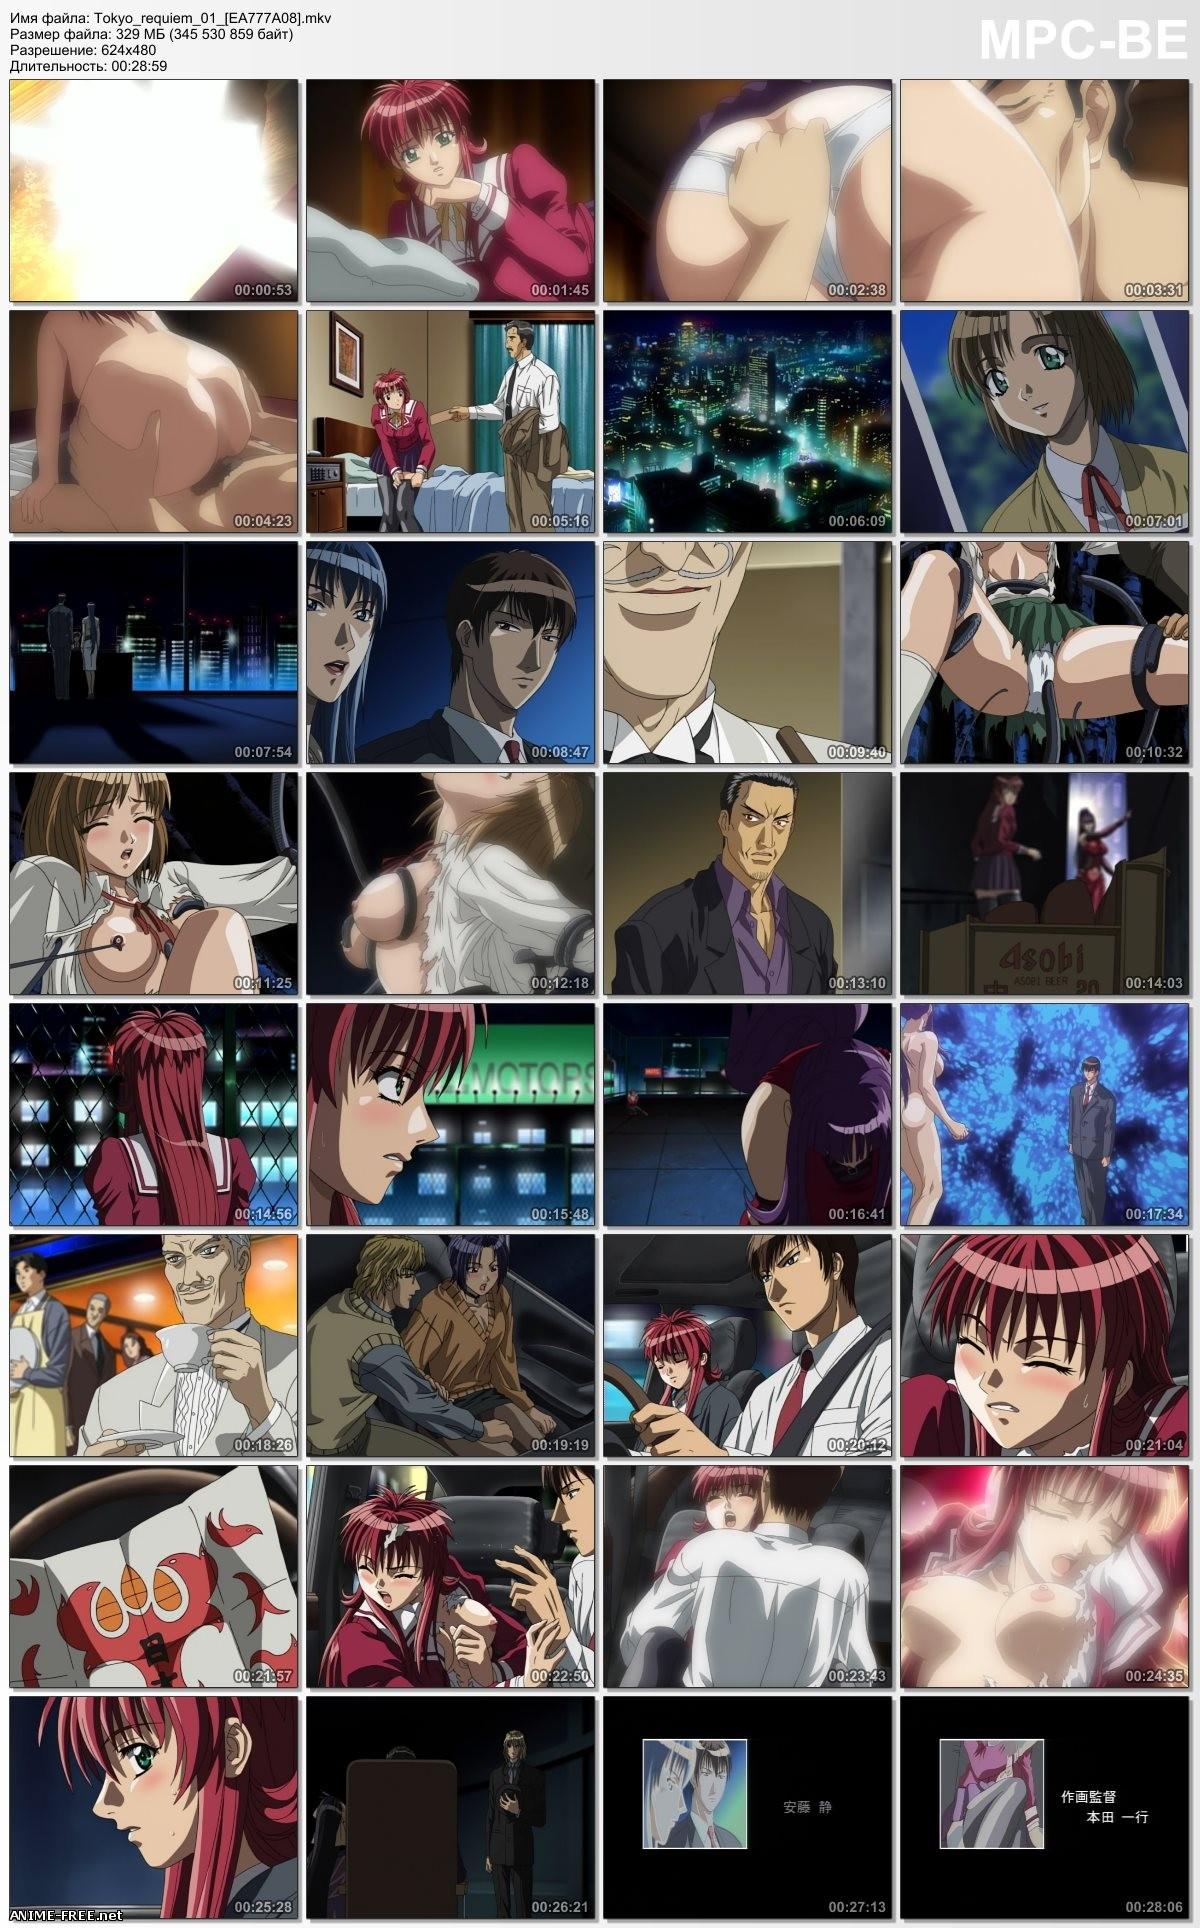 Tokyo Requiem / Toukyou Chinkon Uta / Токийский реквием [2 из 2] [JPN,ENG,RUS] Anime Hentai